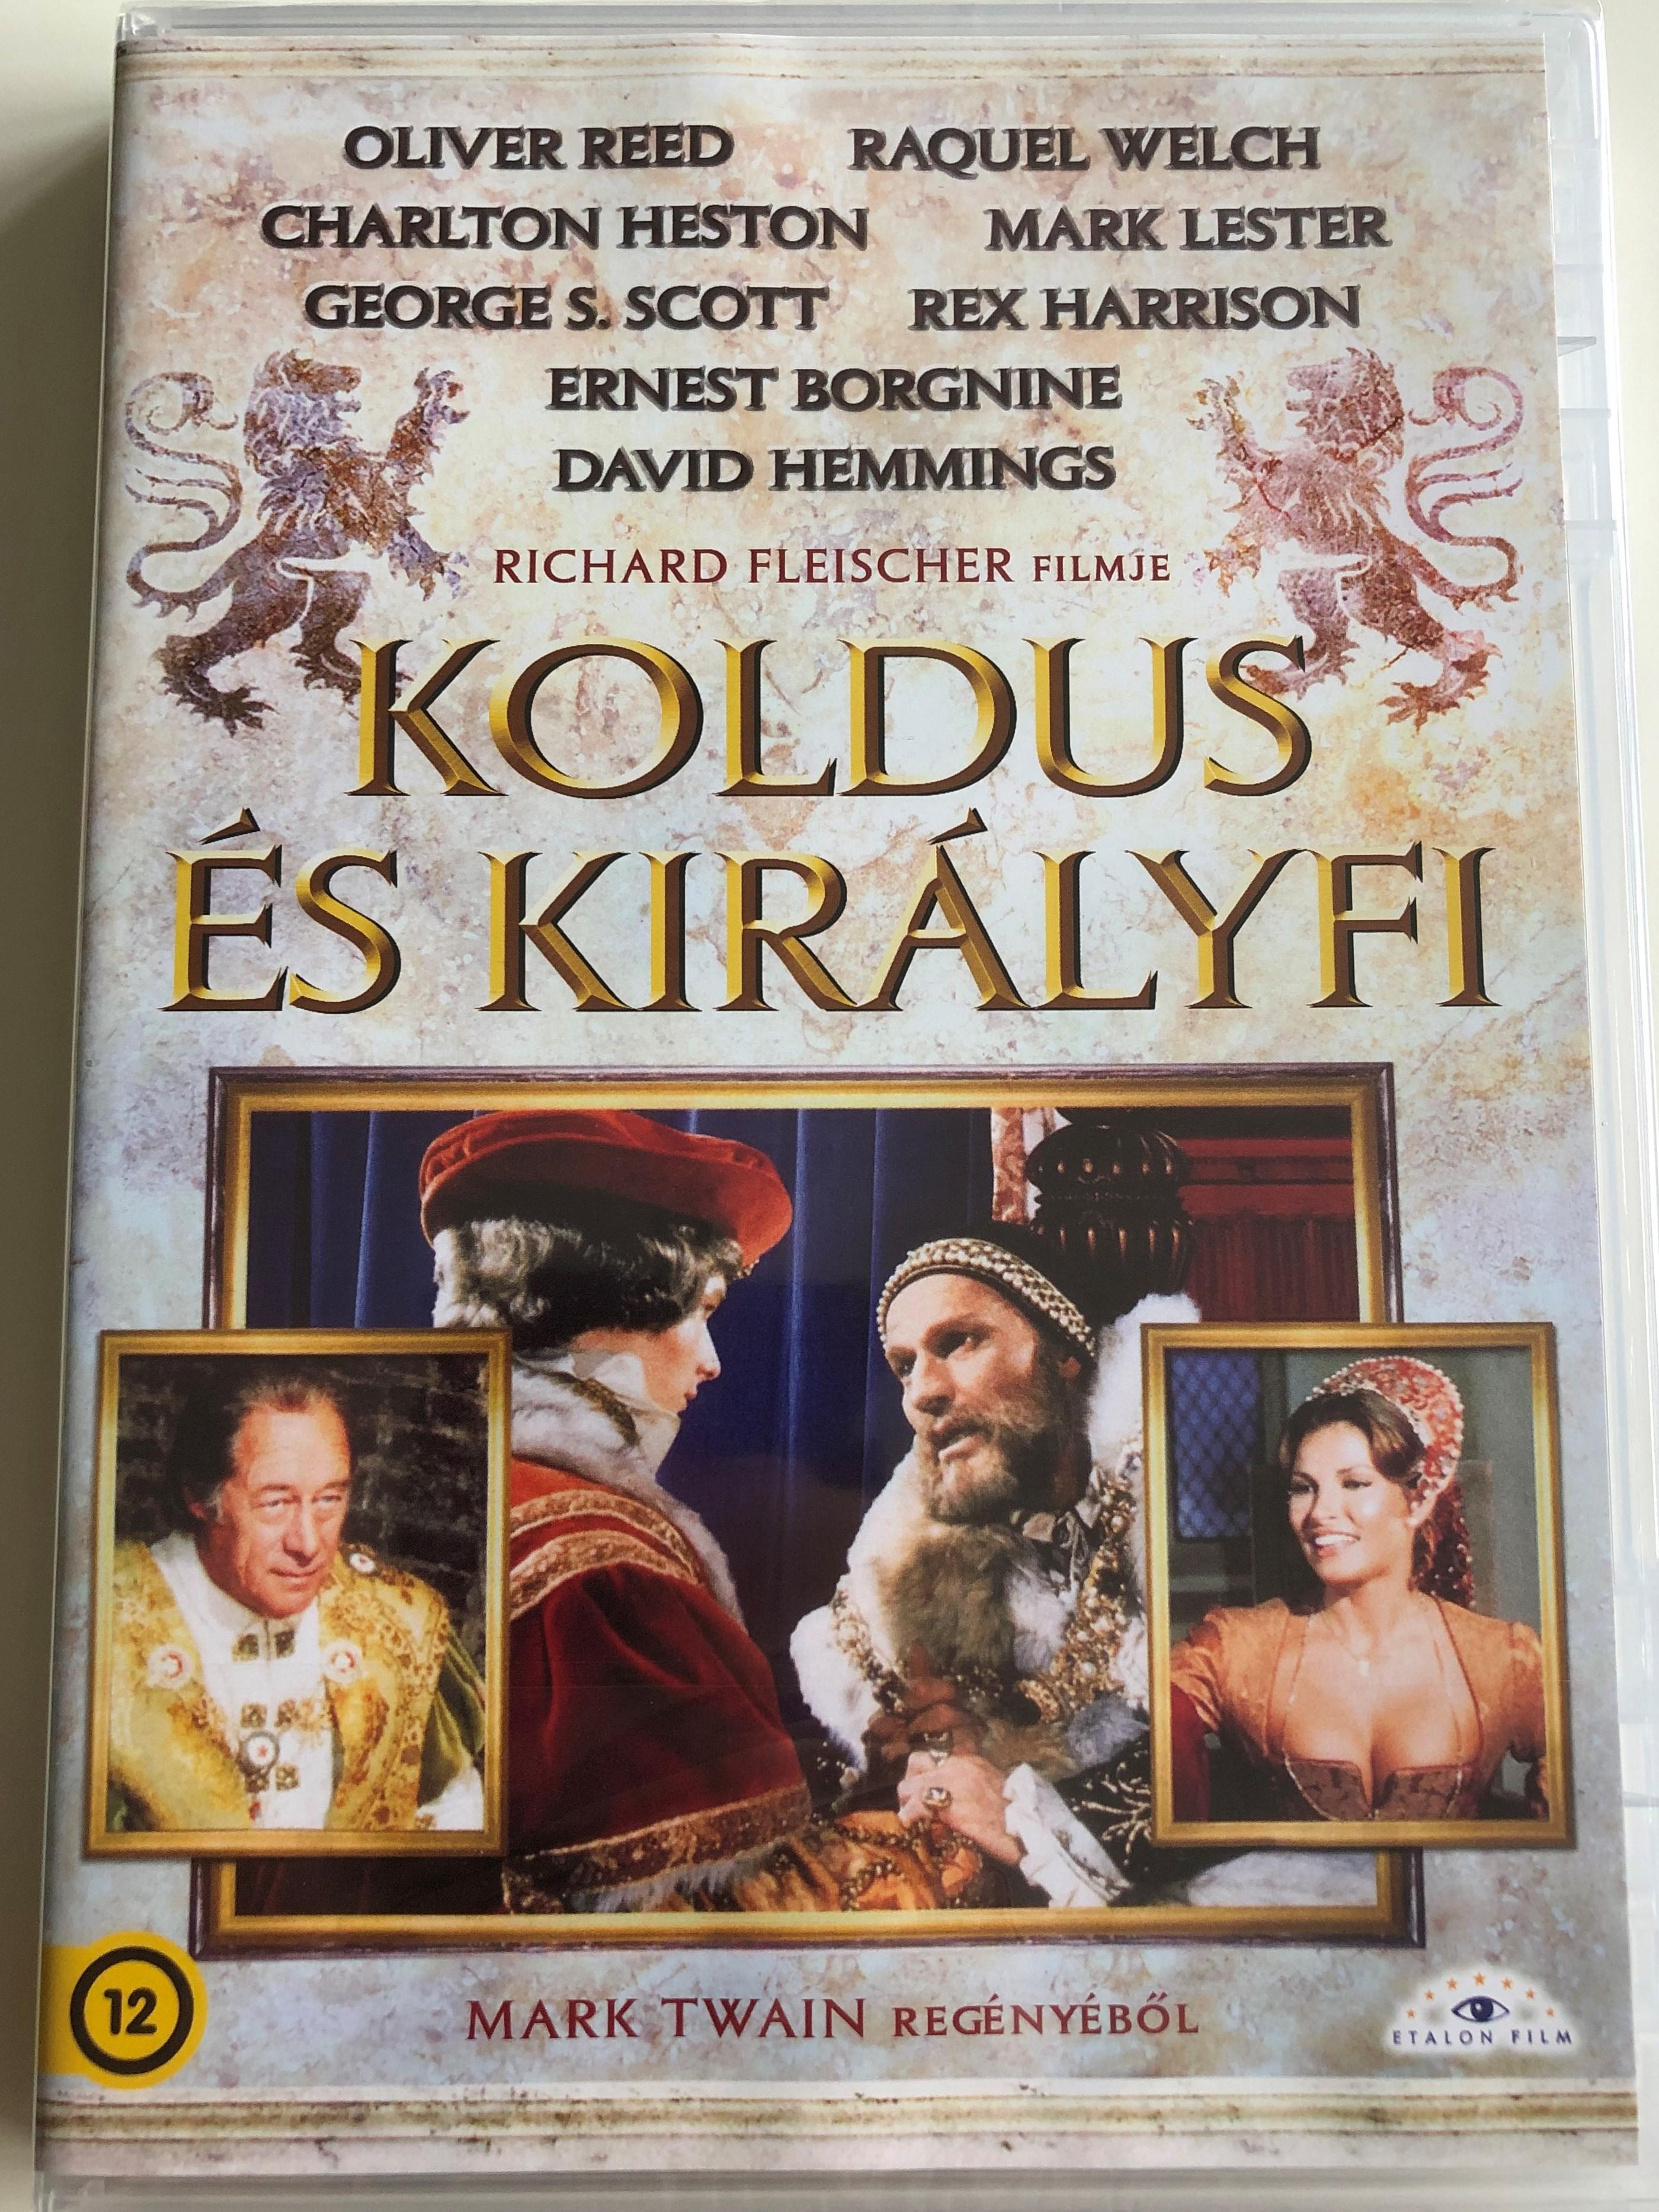 the-prince-and-the-pauper-crossed-swords-dvd-1977-koldus-s-kir-lyfi-directed-by-richard-fleischer-starring-mark-lester-ernest-borgnine-oliver-reed-raquel-welch-rex-harrison-based-on-mark-twain-s-work-1-.jpg